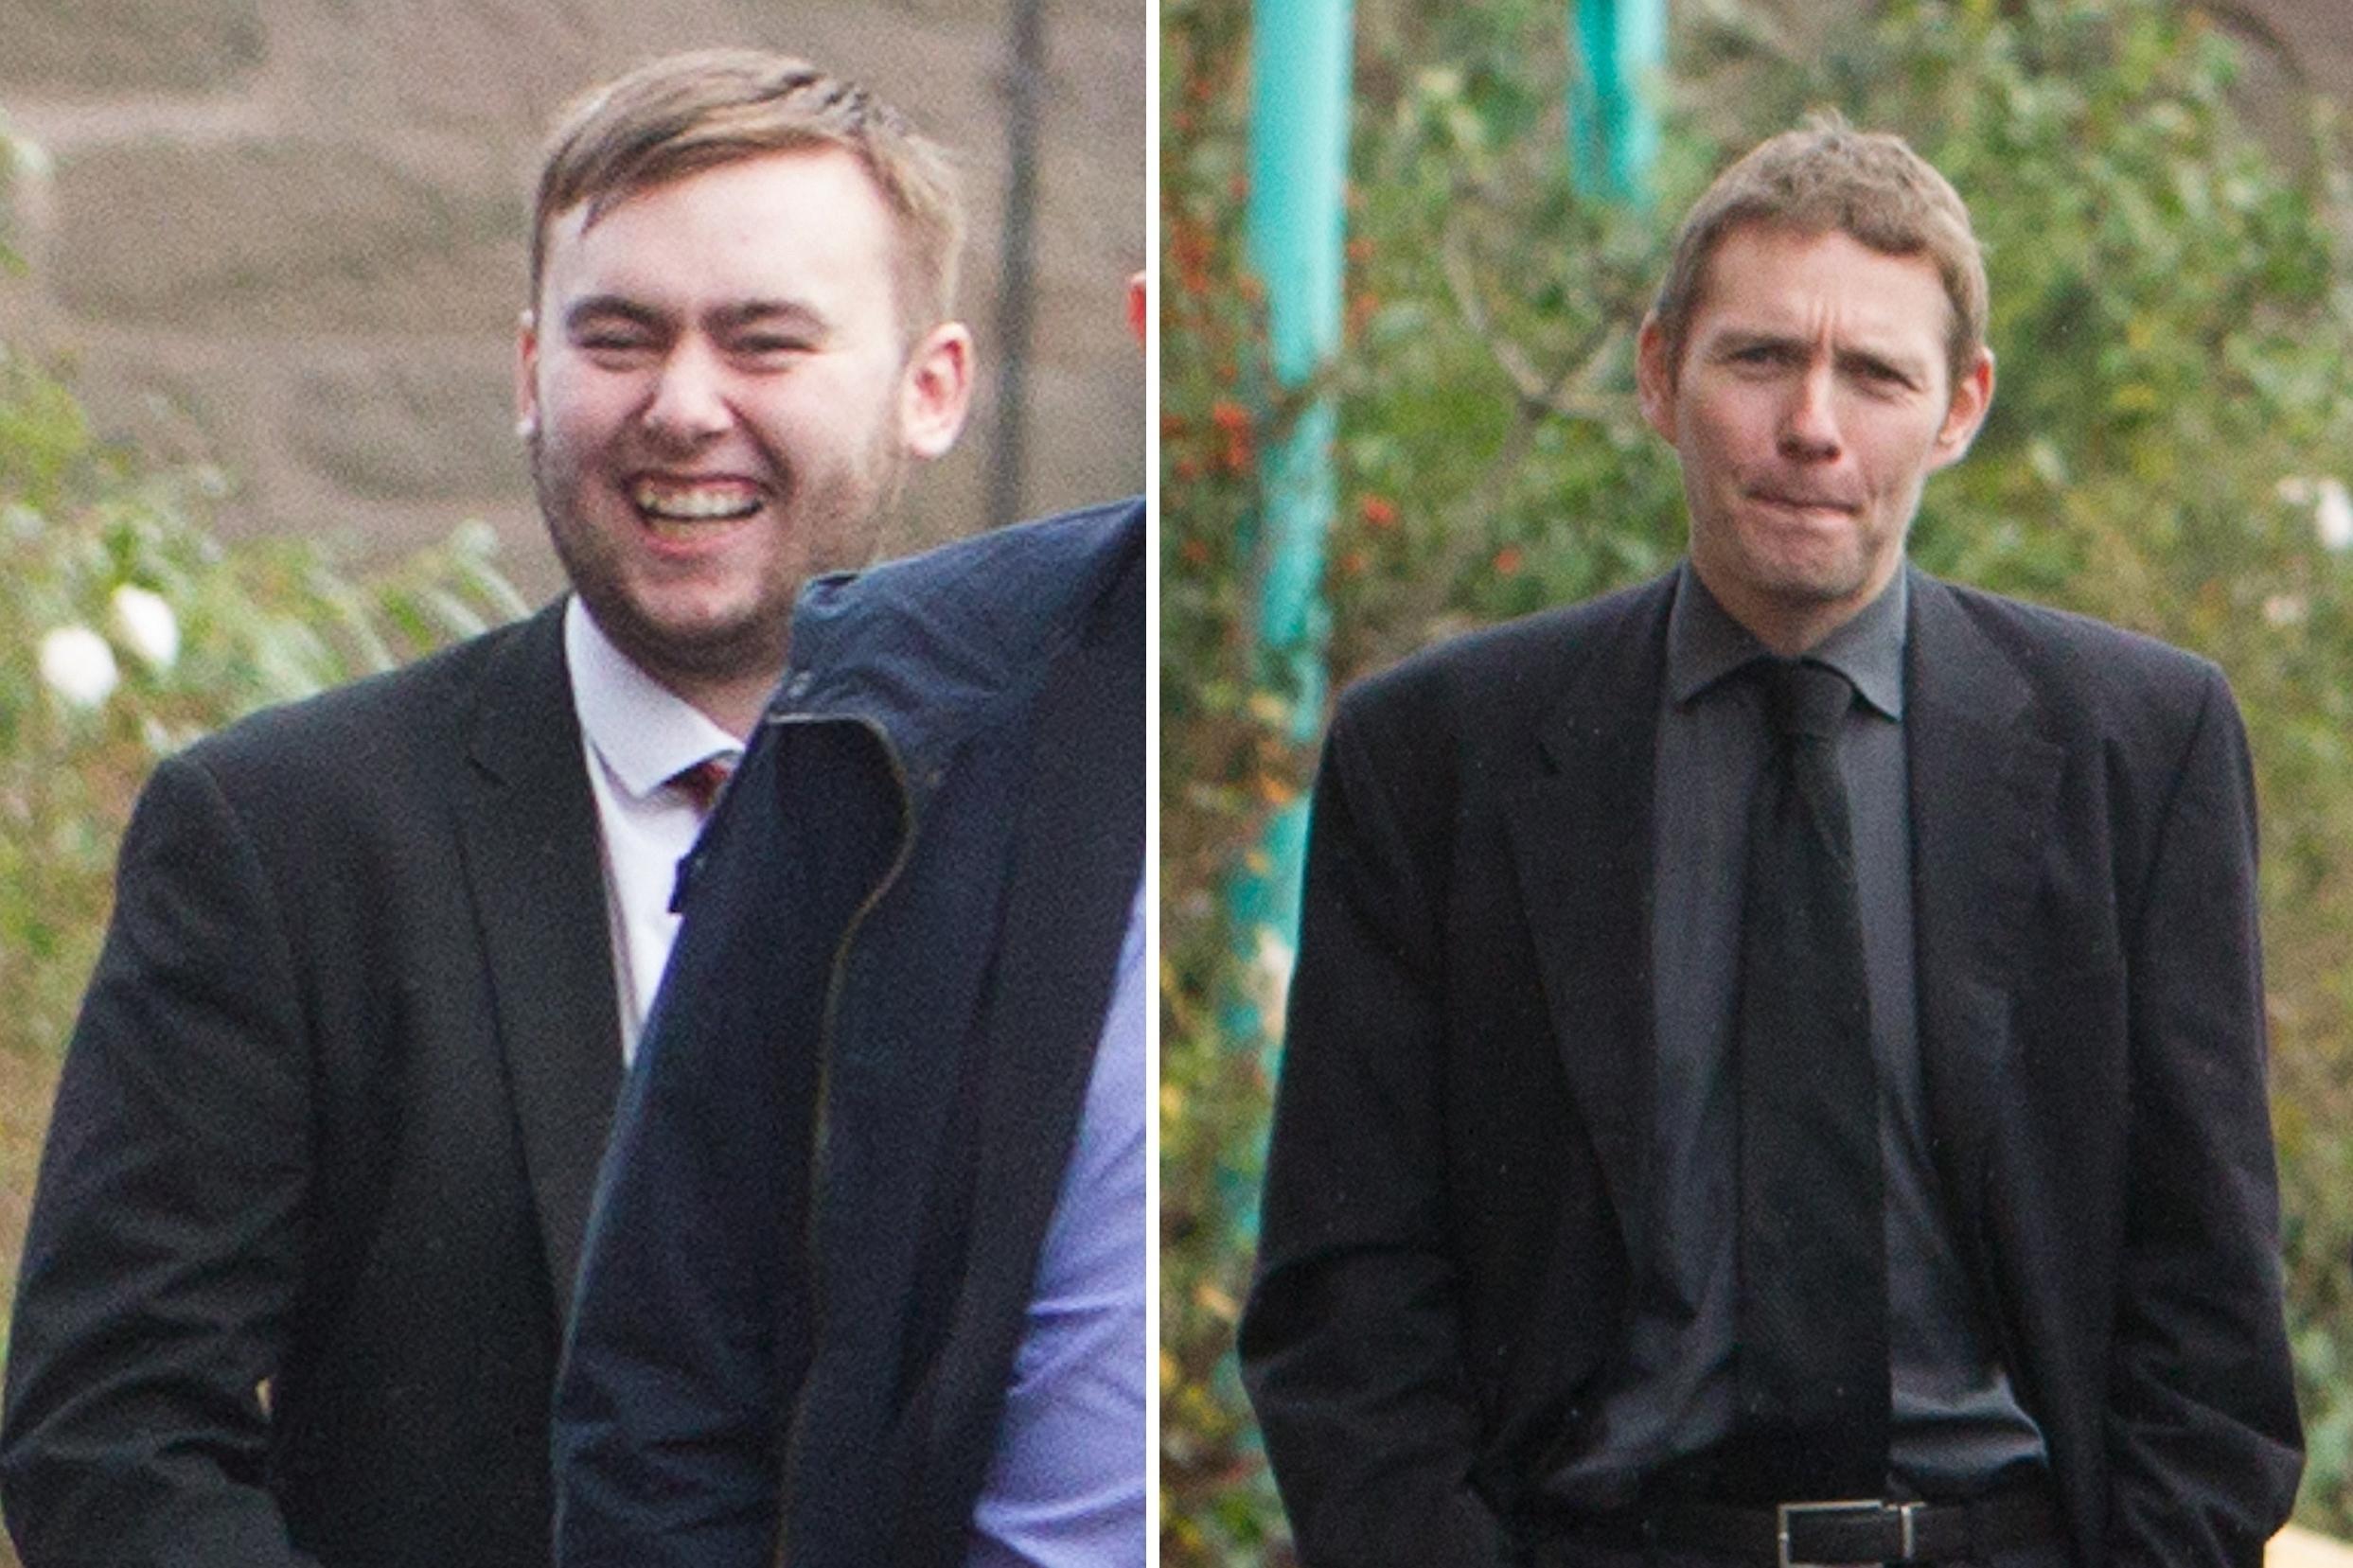 Ryan Lawrence (left) and Ian Bear.